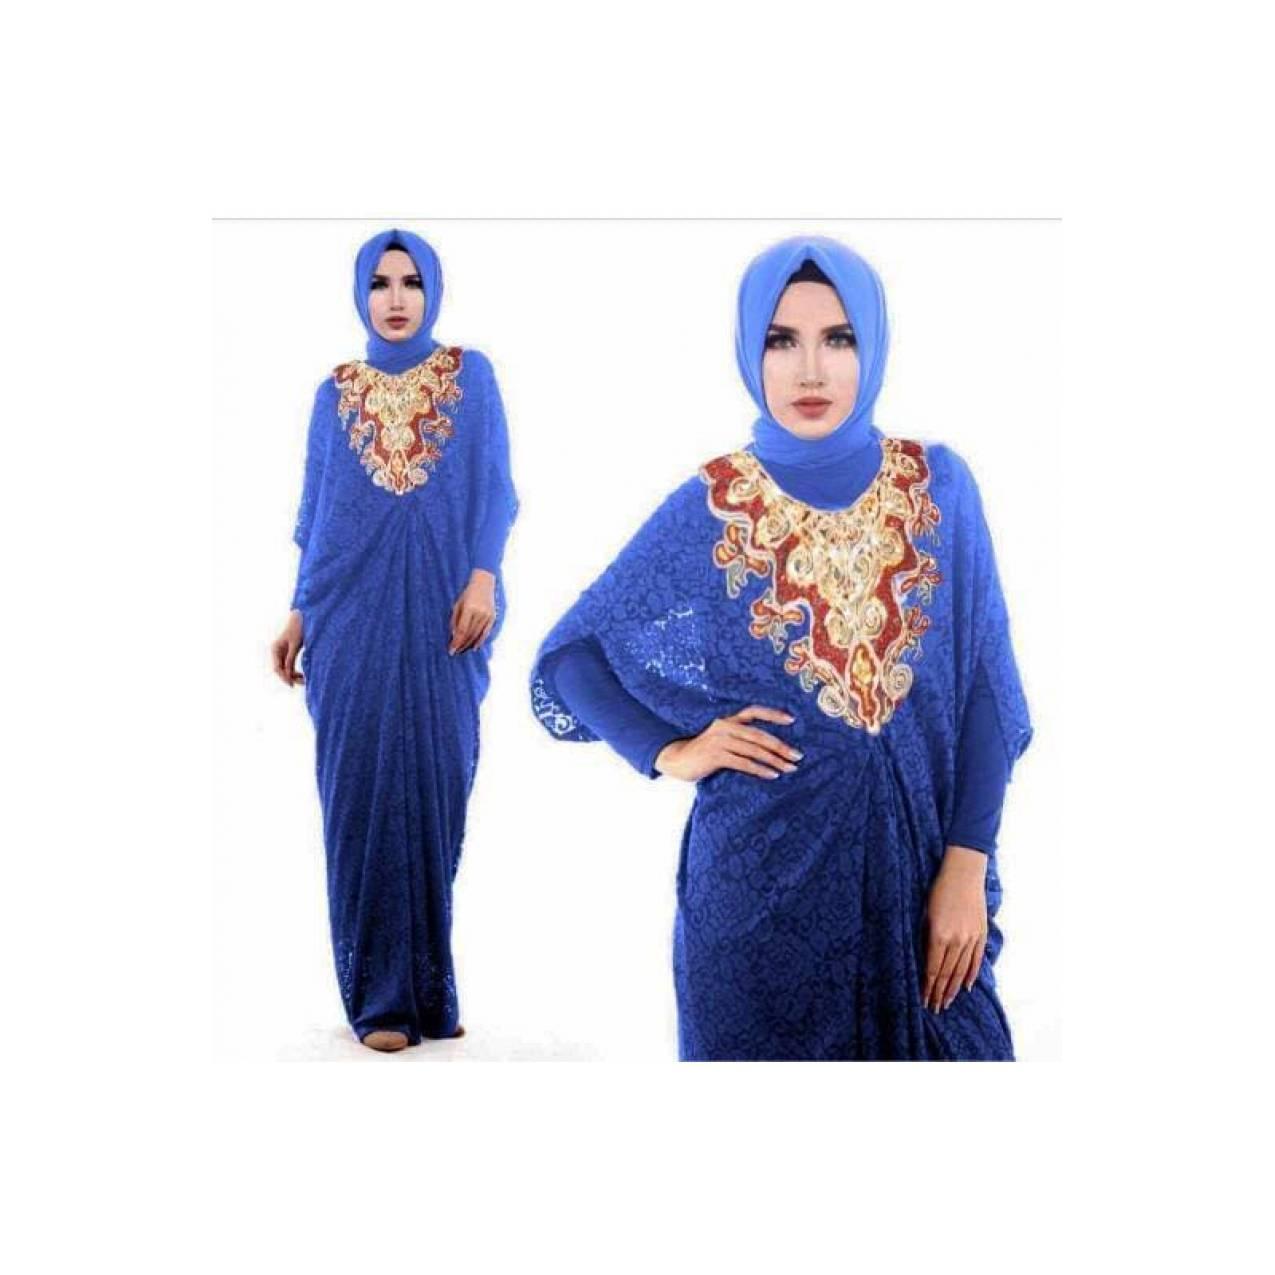 BAJU Kaftan dress Baju Muslim Gamis Kaftan Brokat IMELDA (NAVY, BLUE)